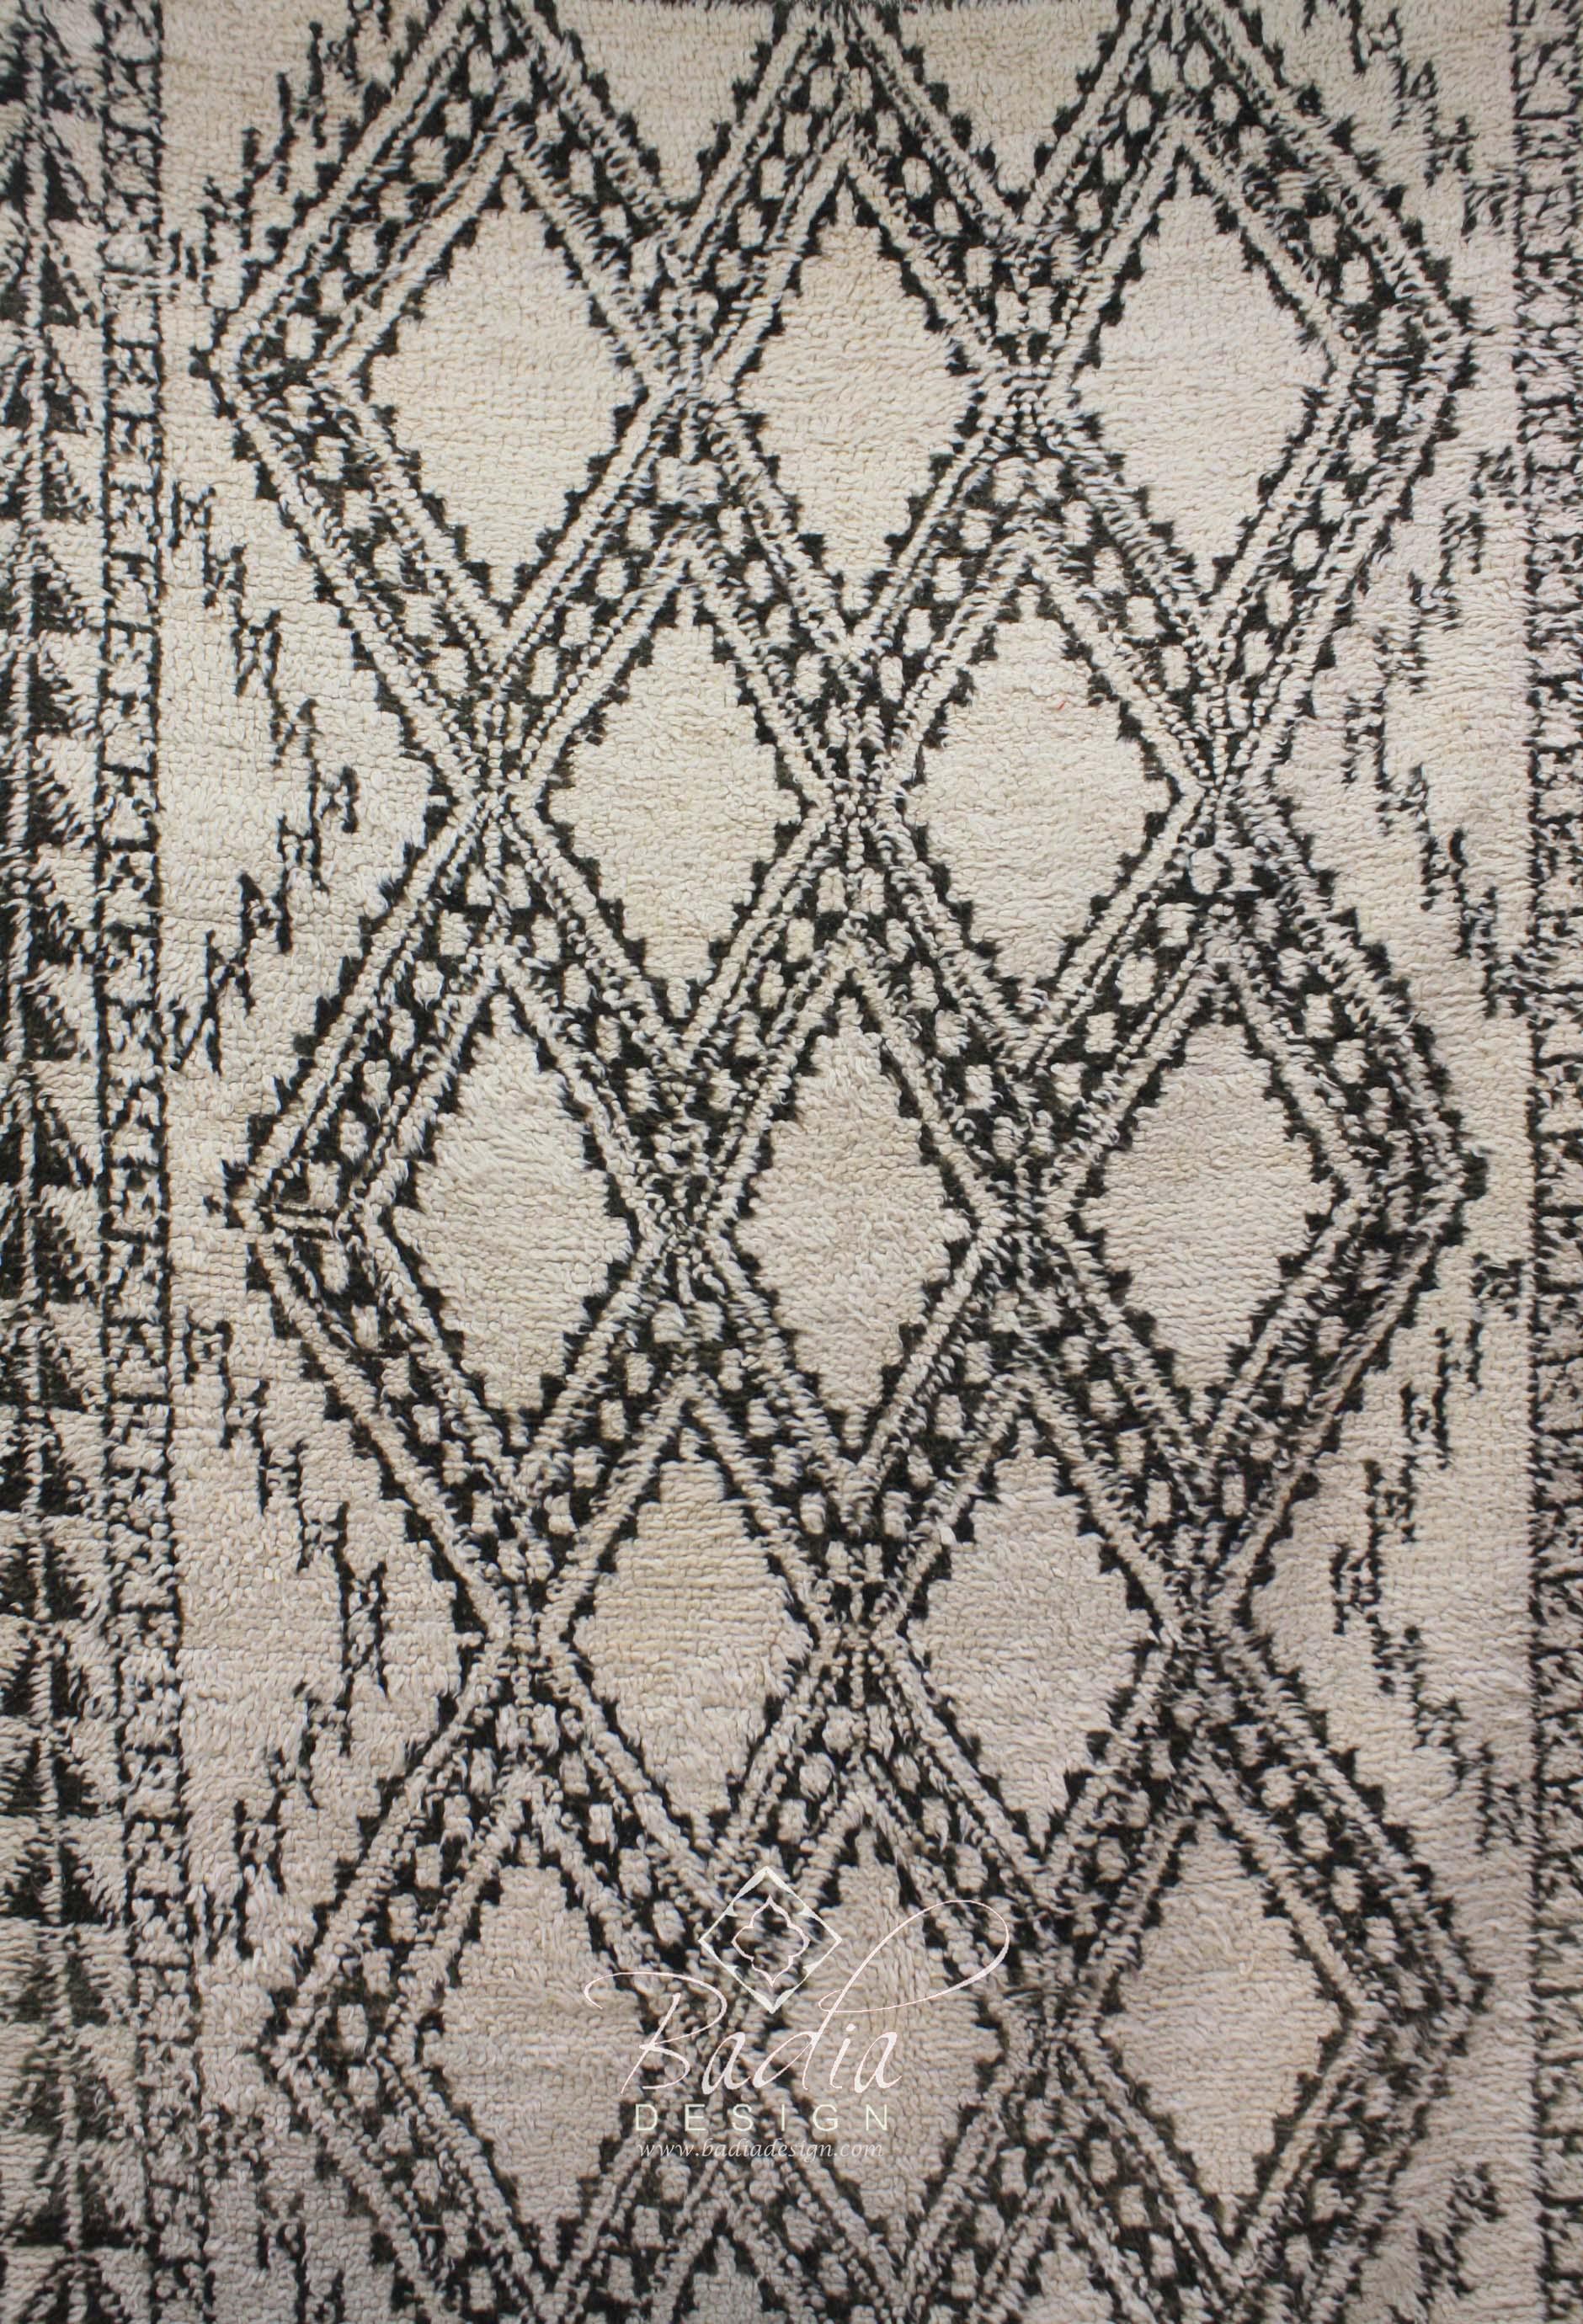 african-style-beni-ouarain-rug-r803-2.jpg